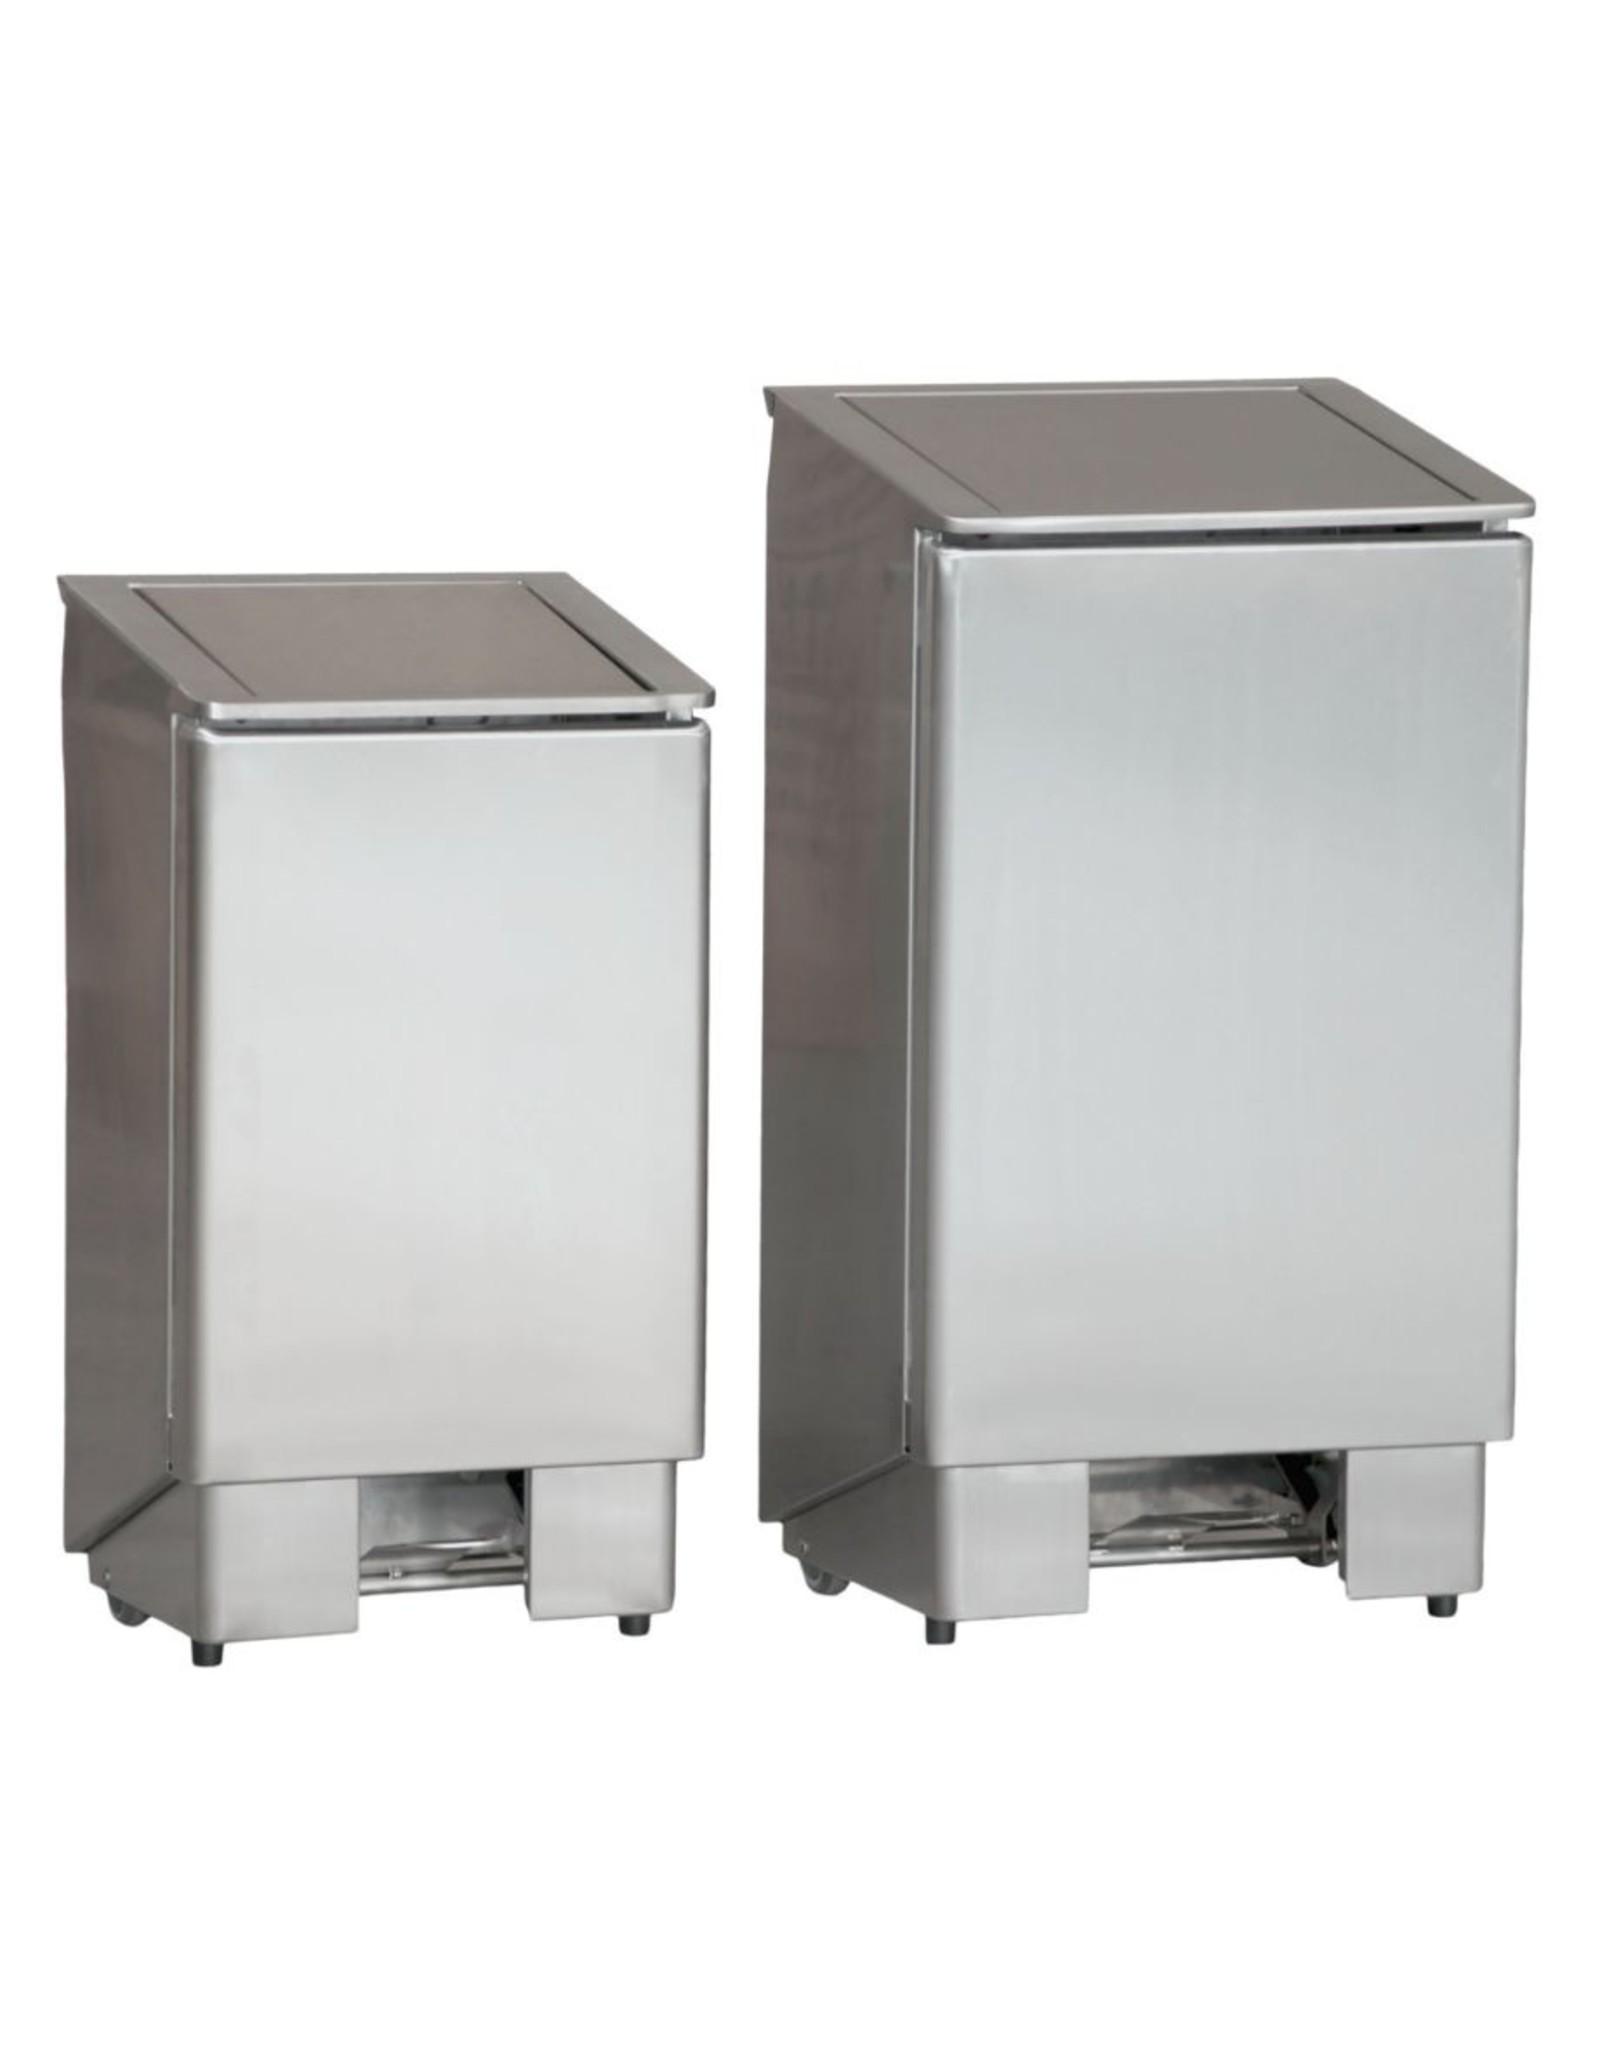 RVS afvalbak met voetpedaal | 60L | (H)80x(B)37x(D)40cm